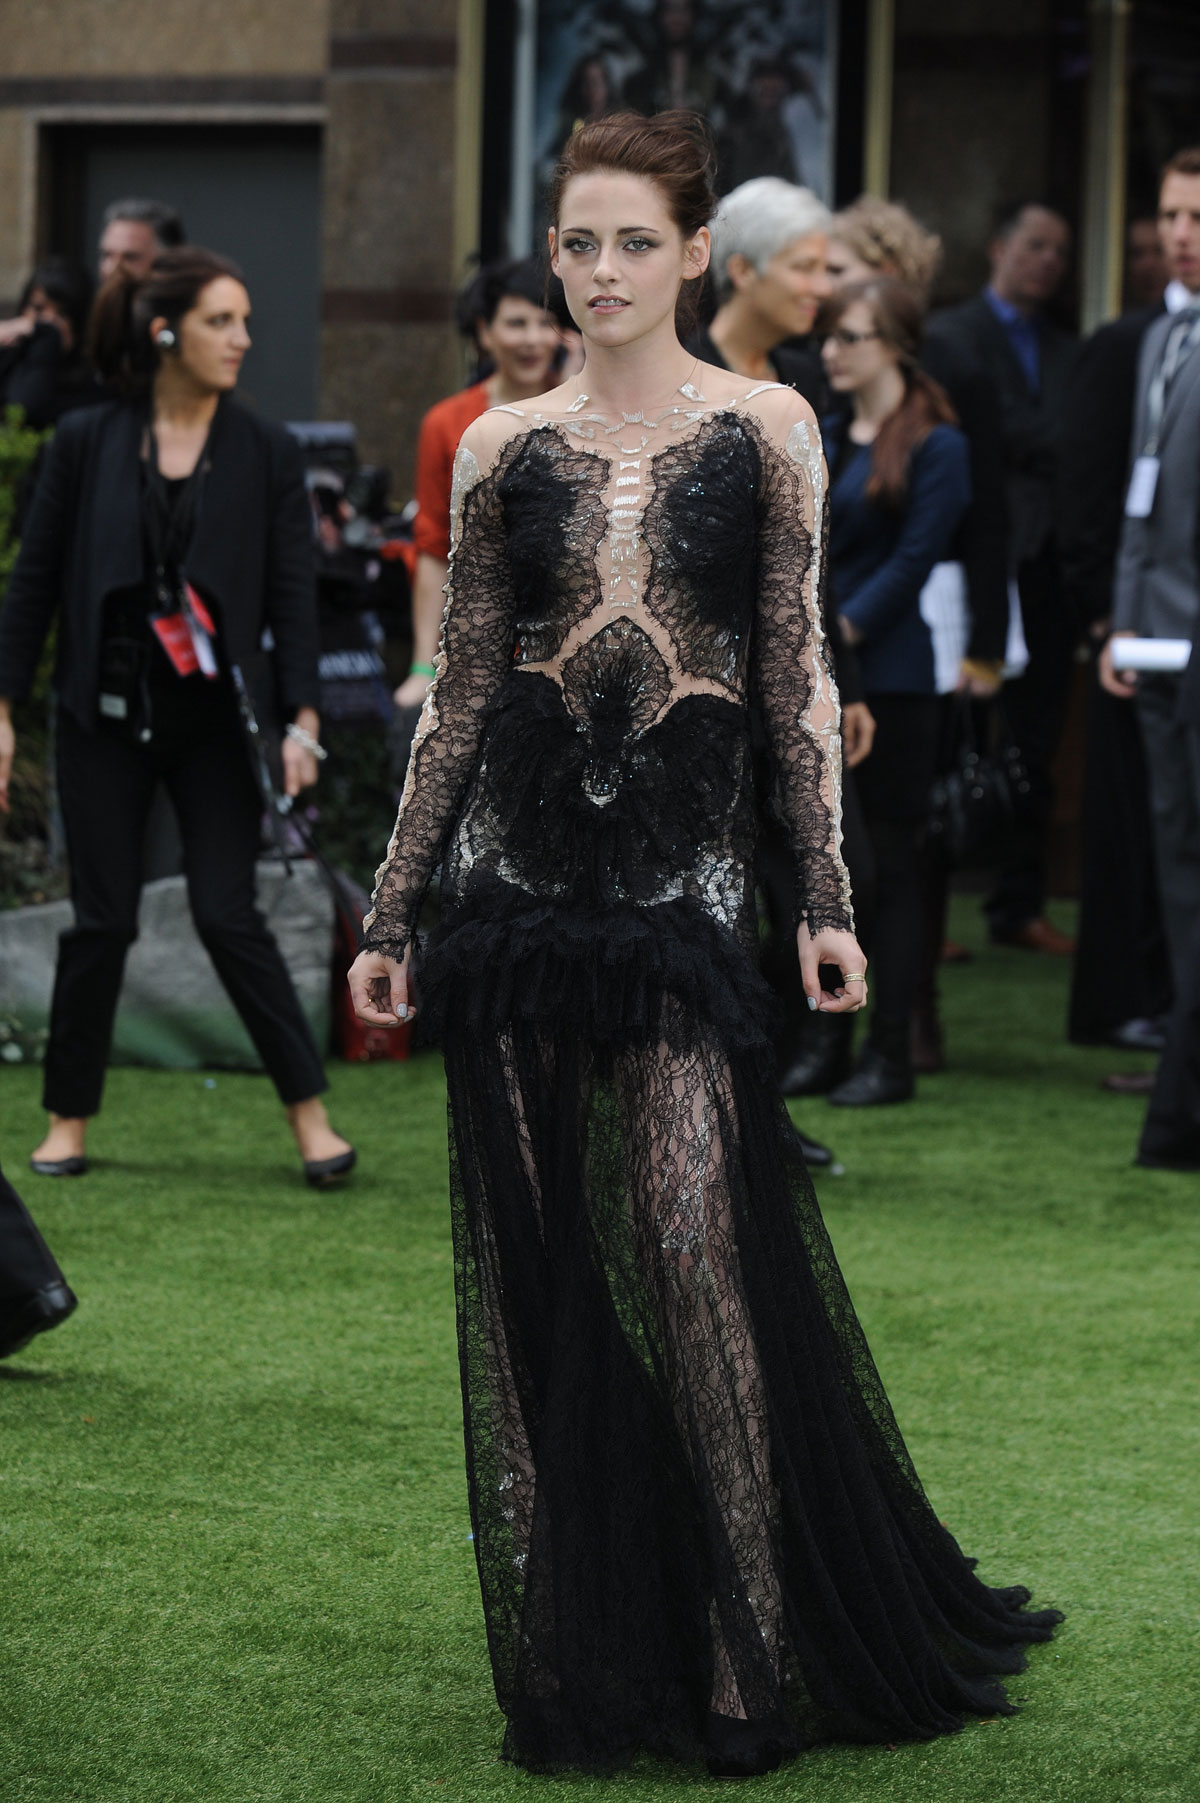 Kristen Stewart Premiere Of Snow White And The Huntsman